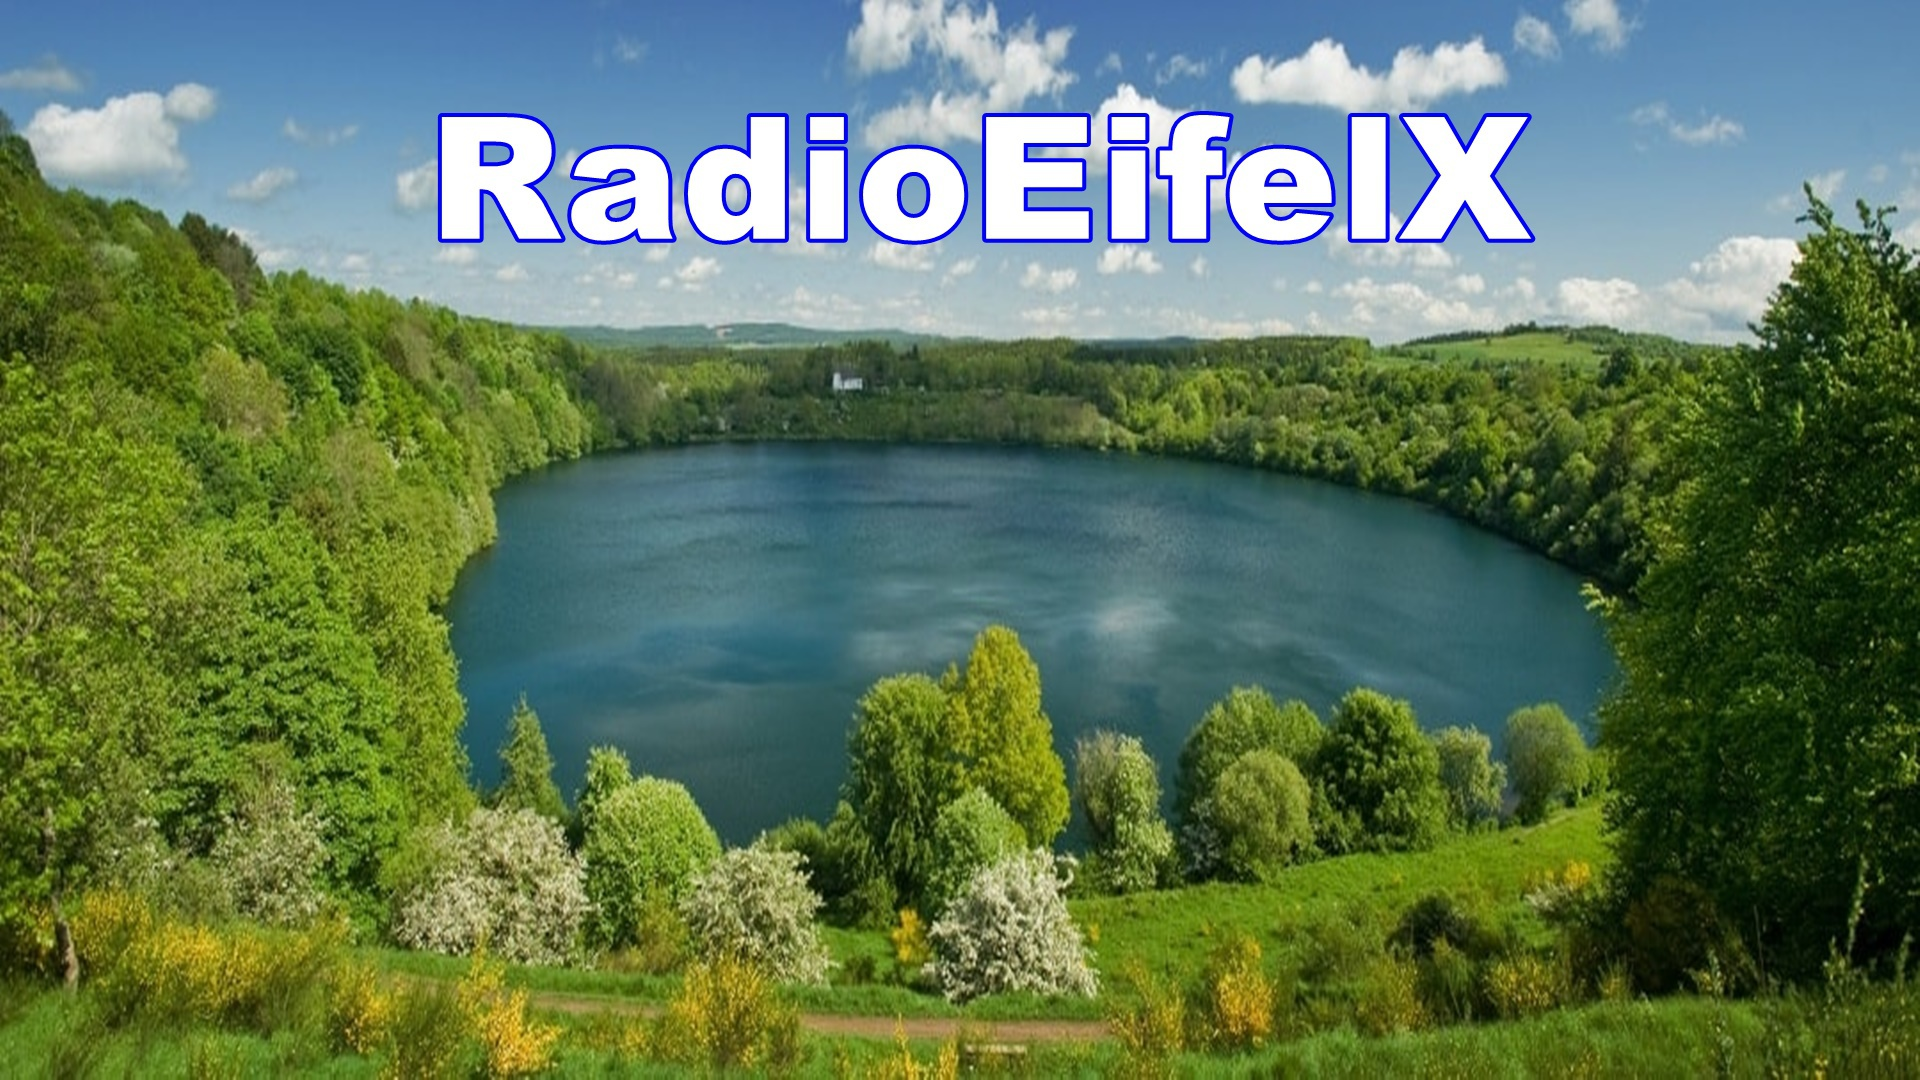 195 RadioEifelX